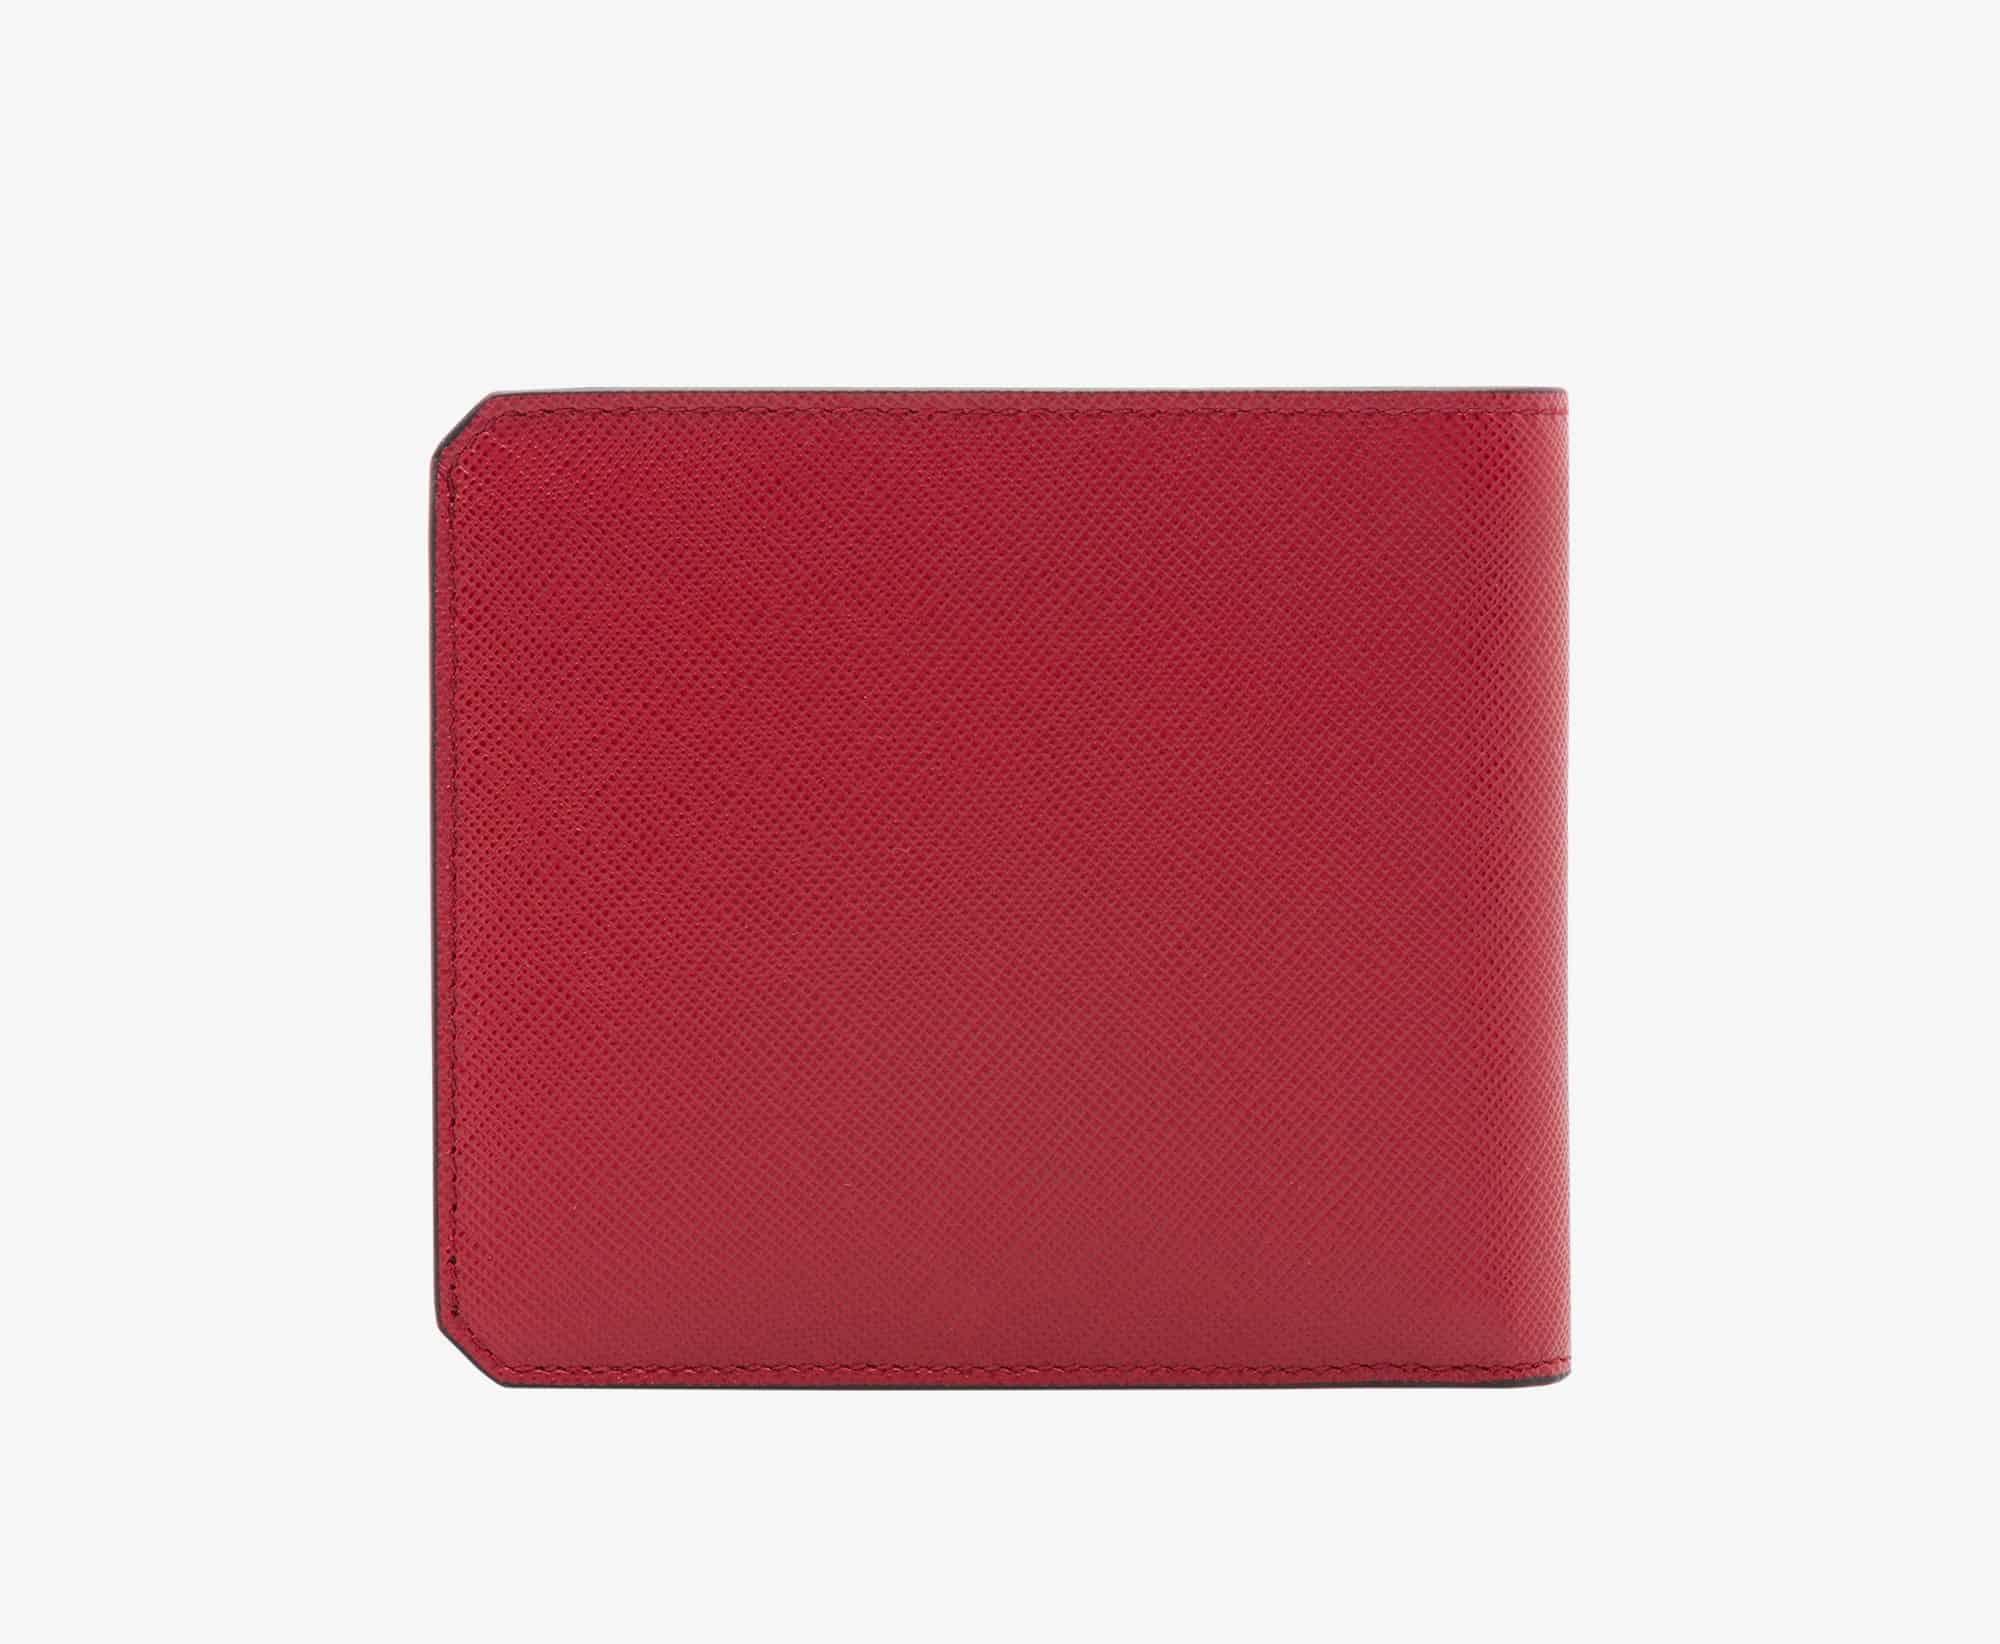 prada red wallet men